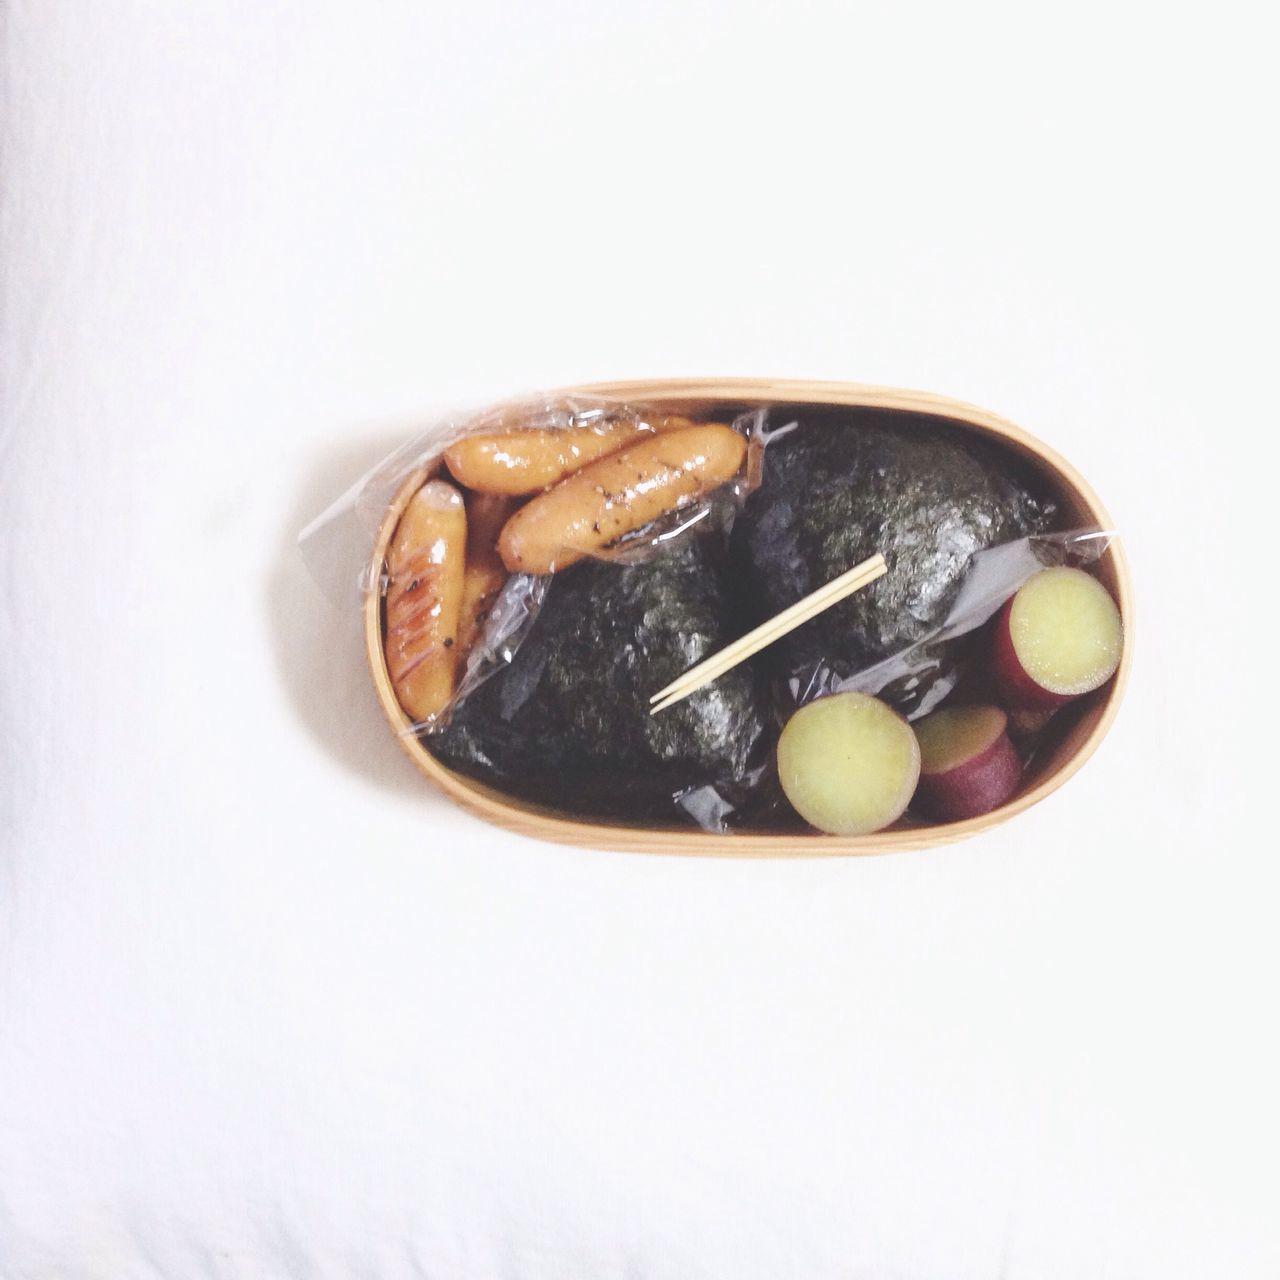 Good Morning Bento Lunch Box Lunch Time! 手抜き弁 Enjoying Life